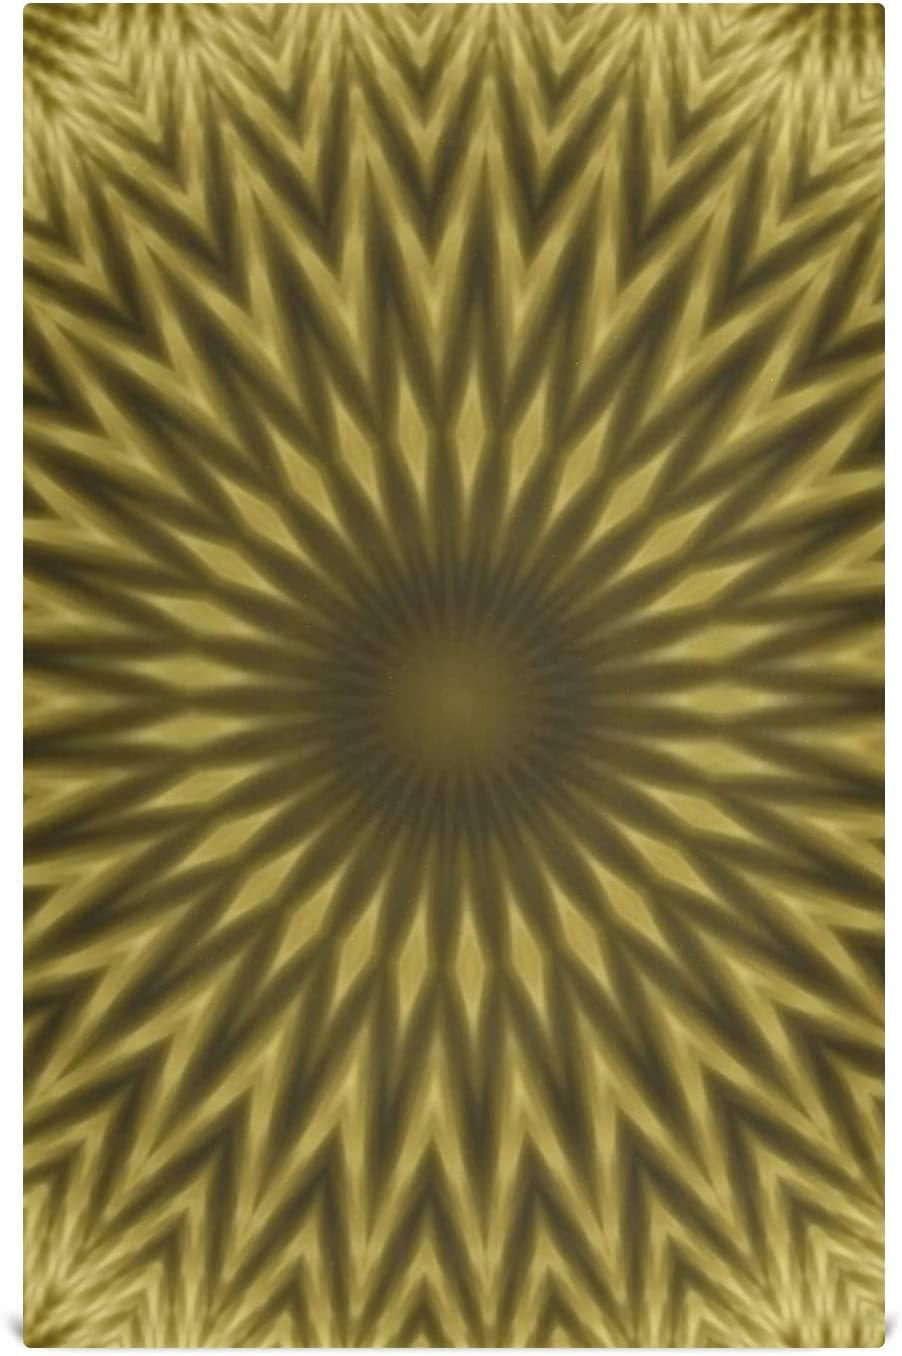 HJSHG Kitchen Dish Towel 6 Kaleidoscope Large2 Max 74% OFF Weekly update Set